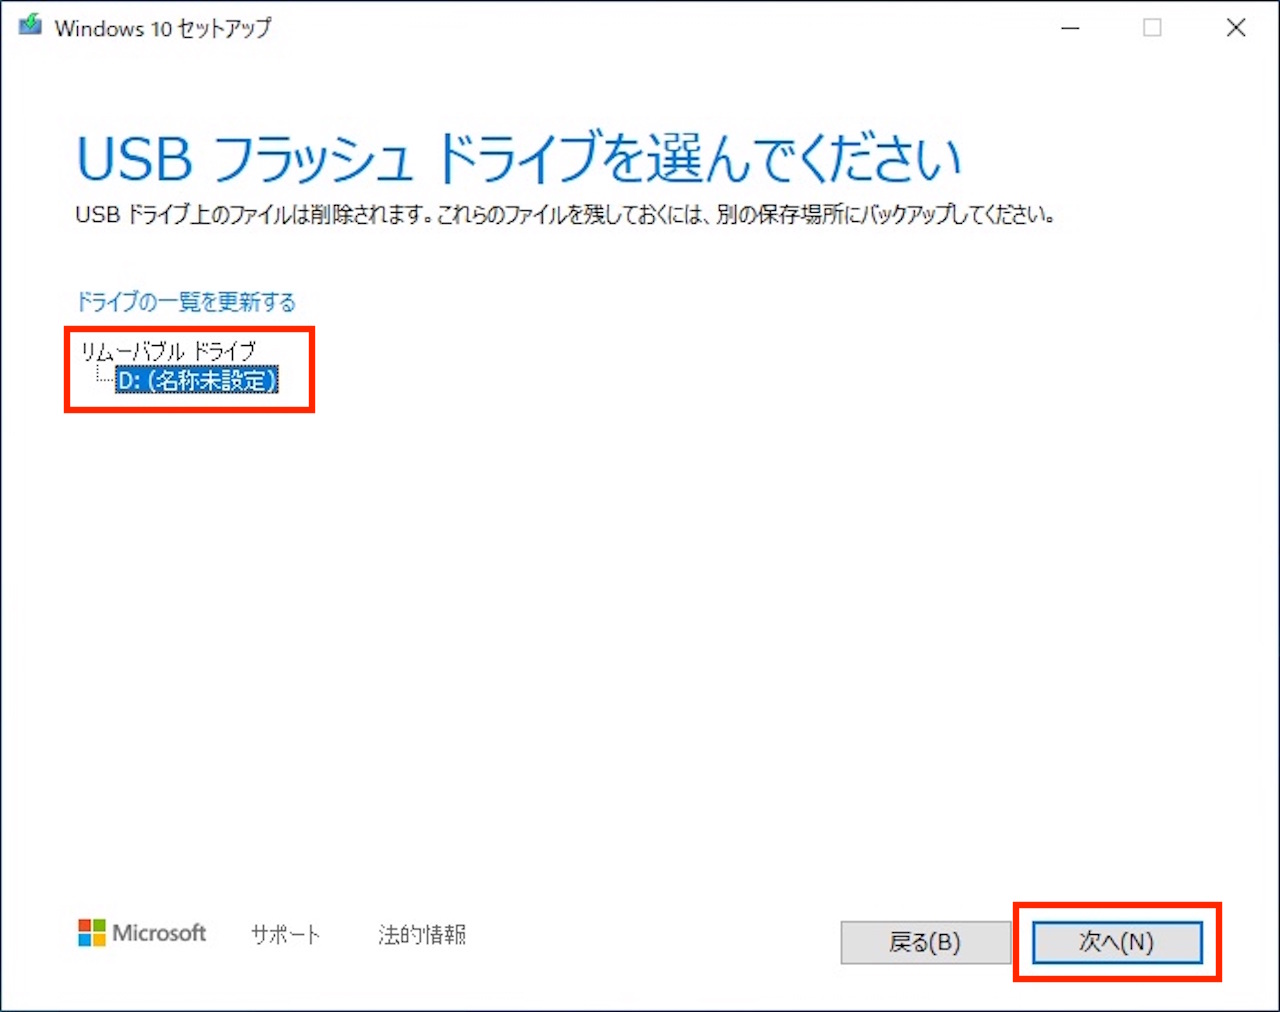 Windows10のインストール用USBメモリの作成方法⑪